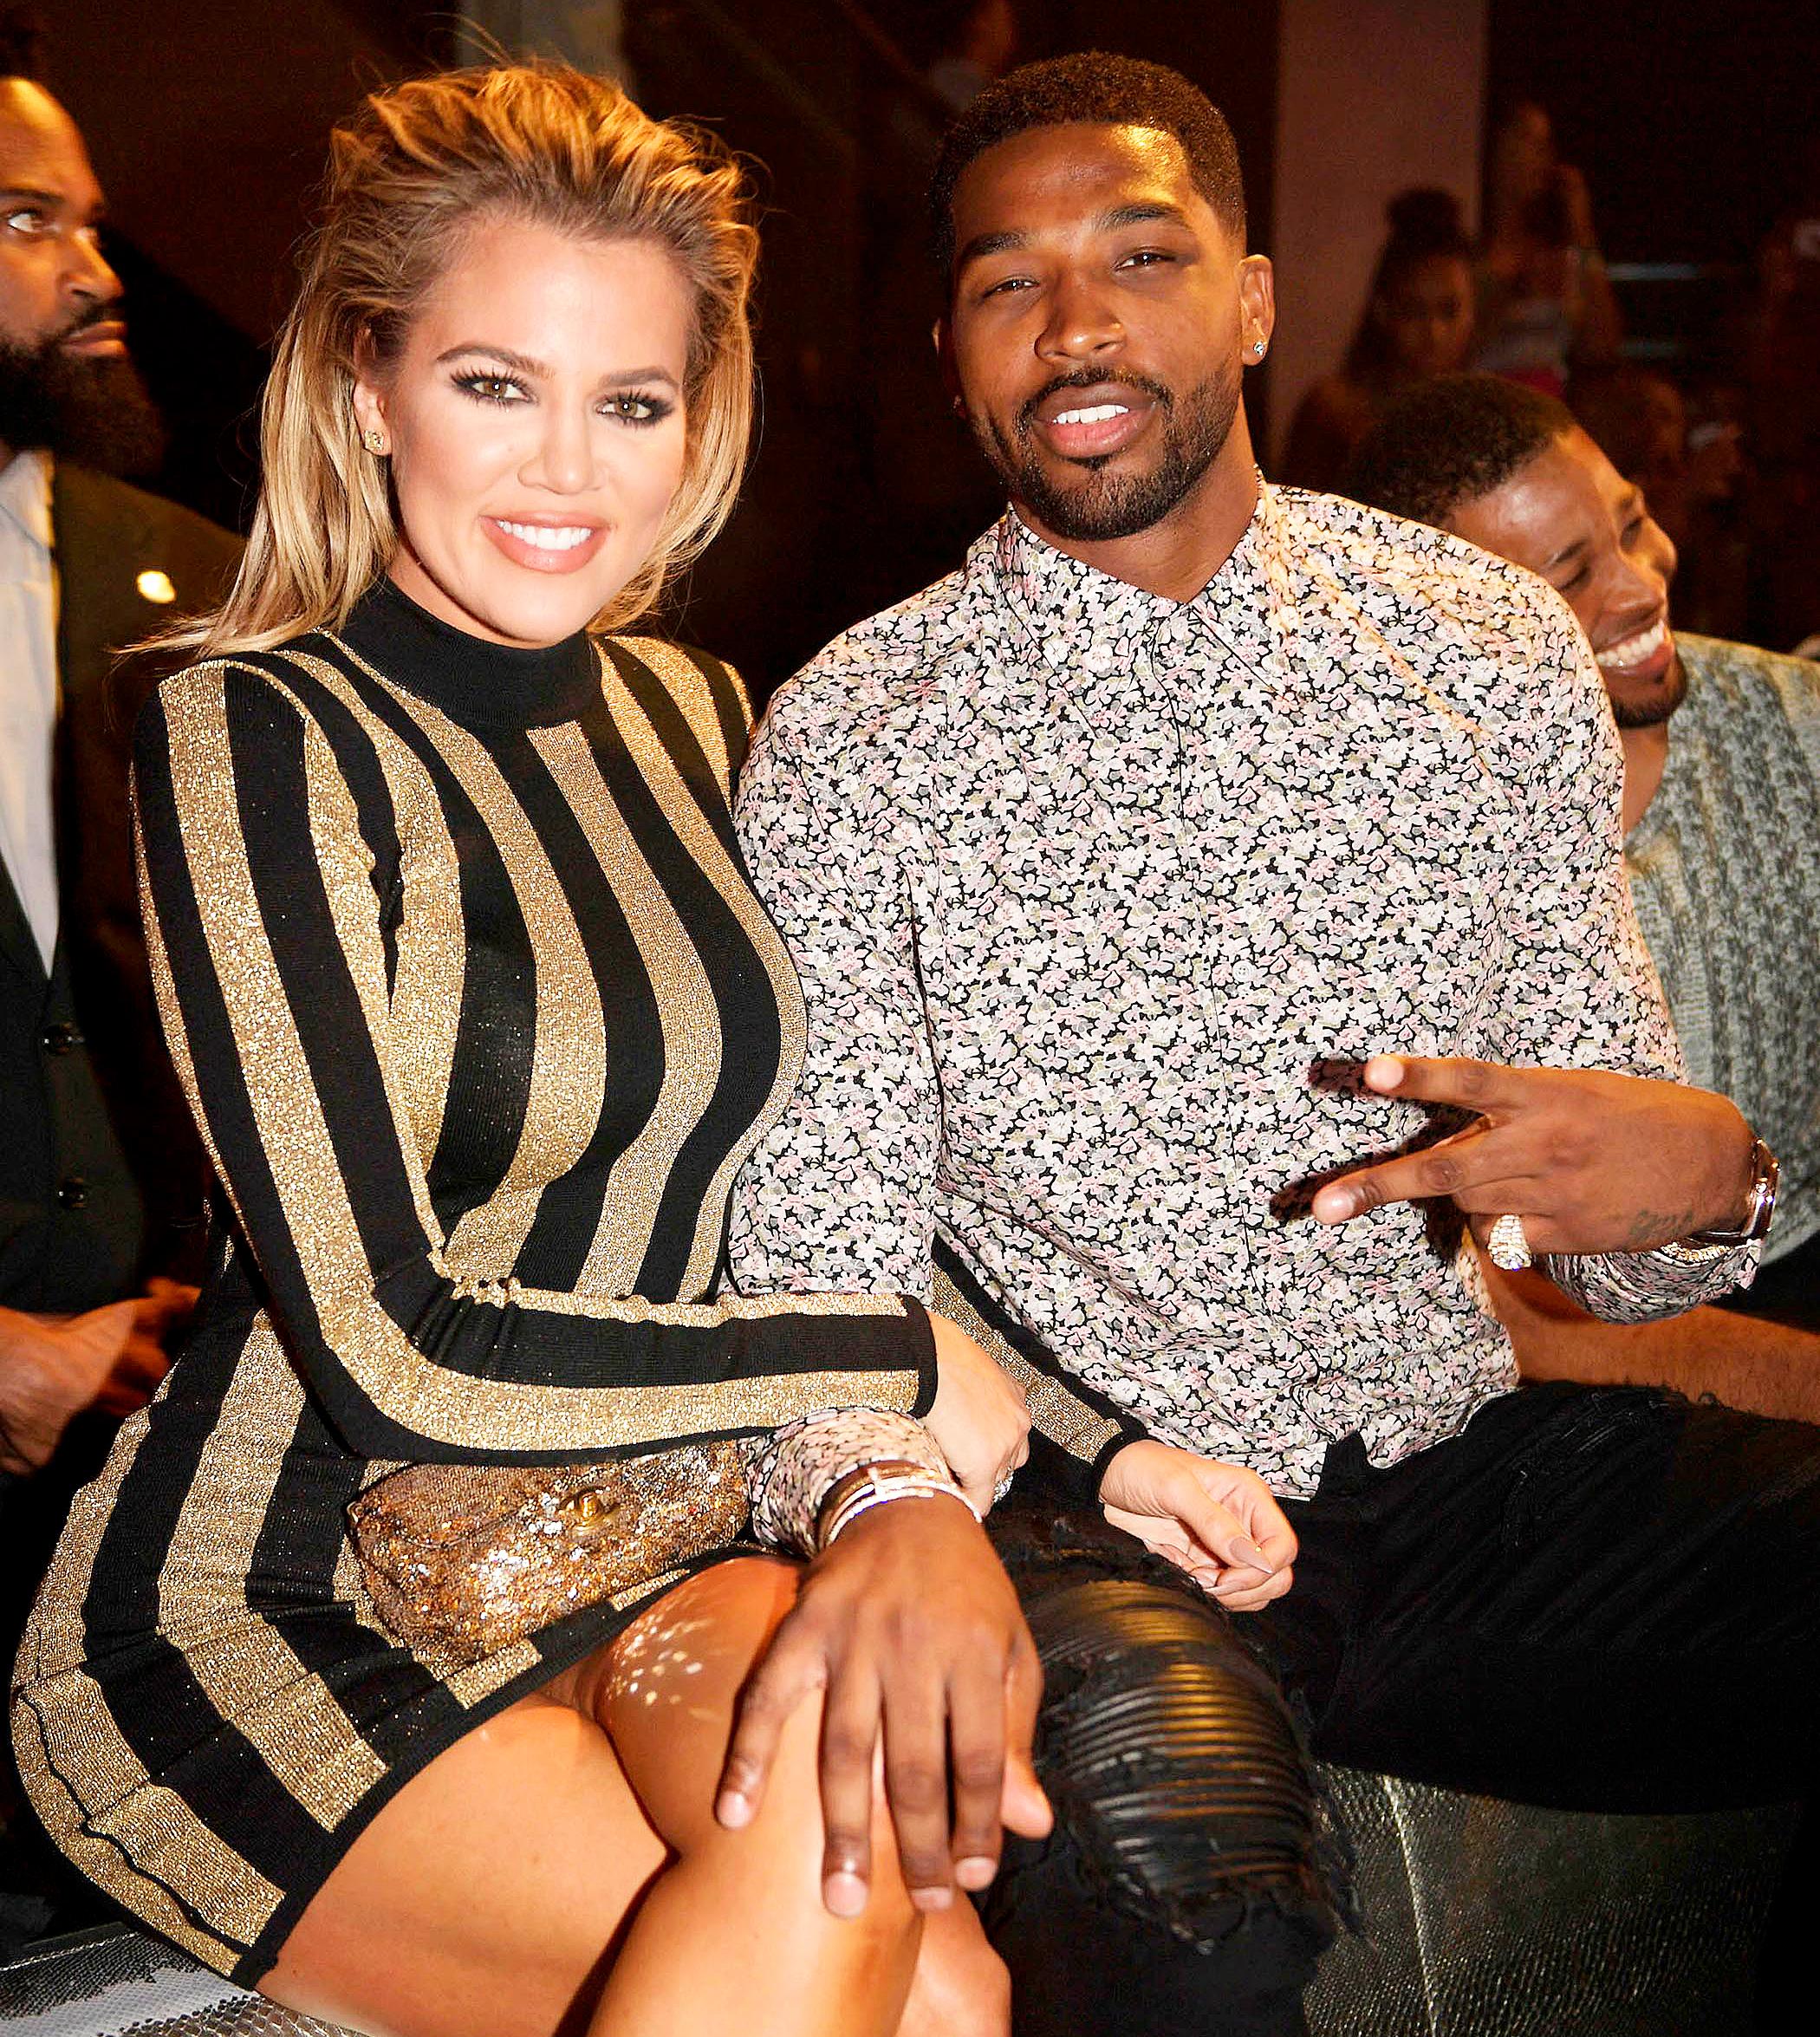 Kris Jenner Plays Coy About Khloe Kardashian and Tristan Thompson's Status